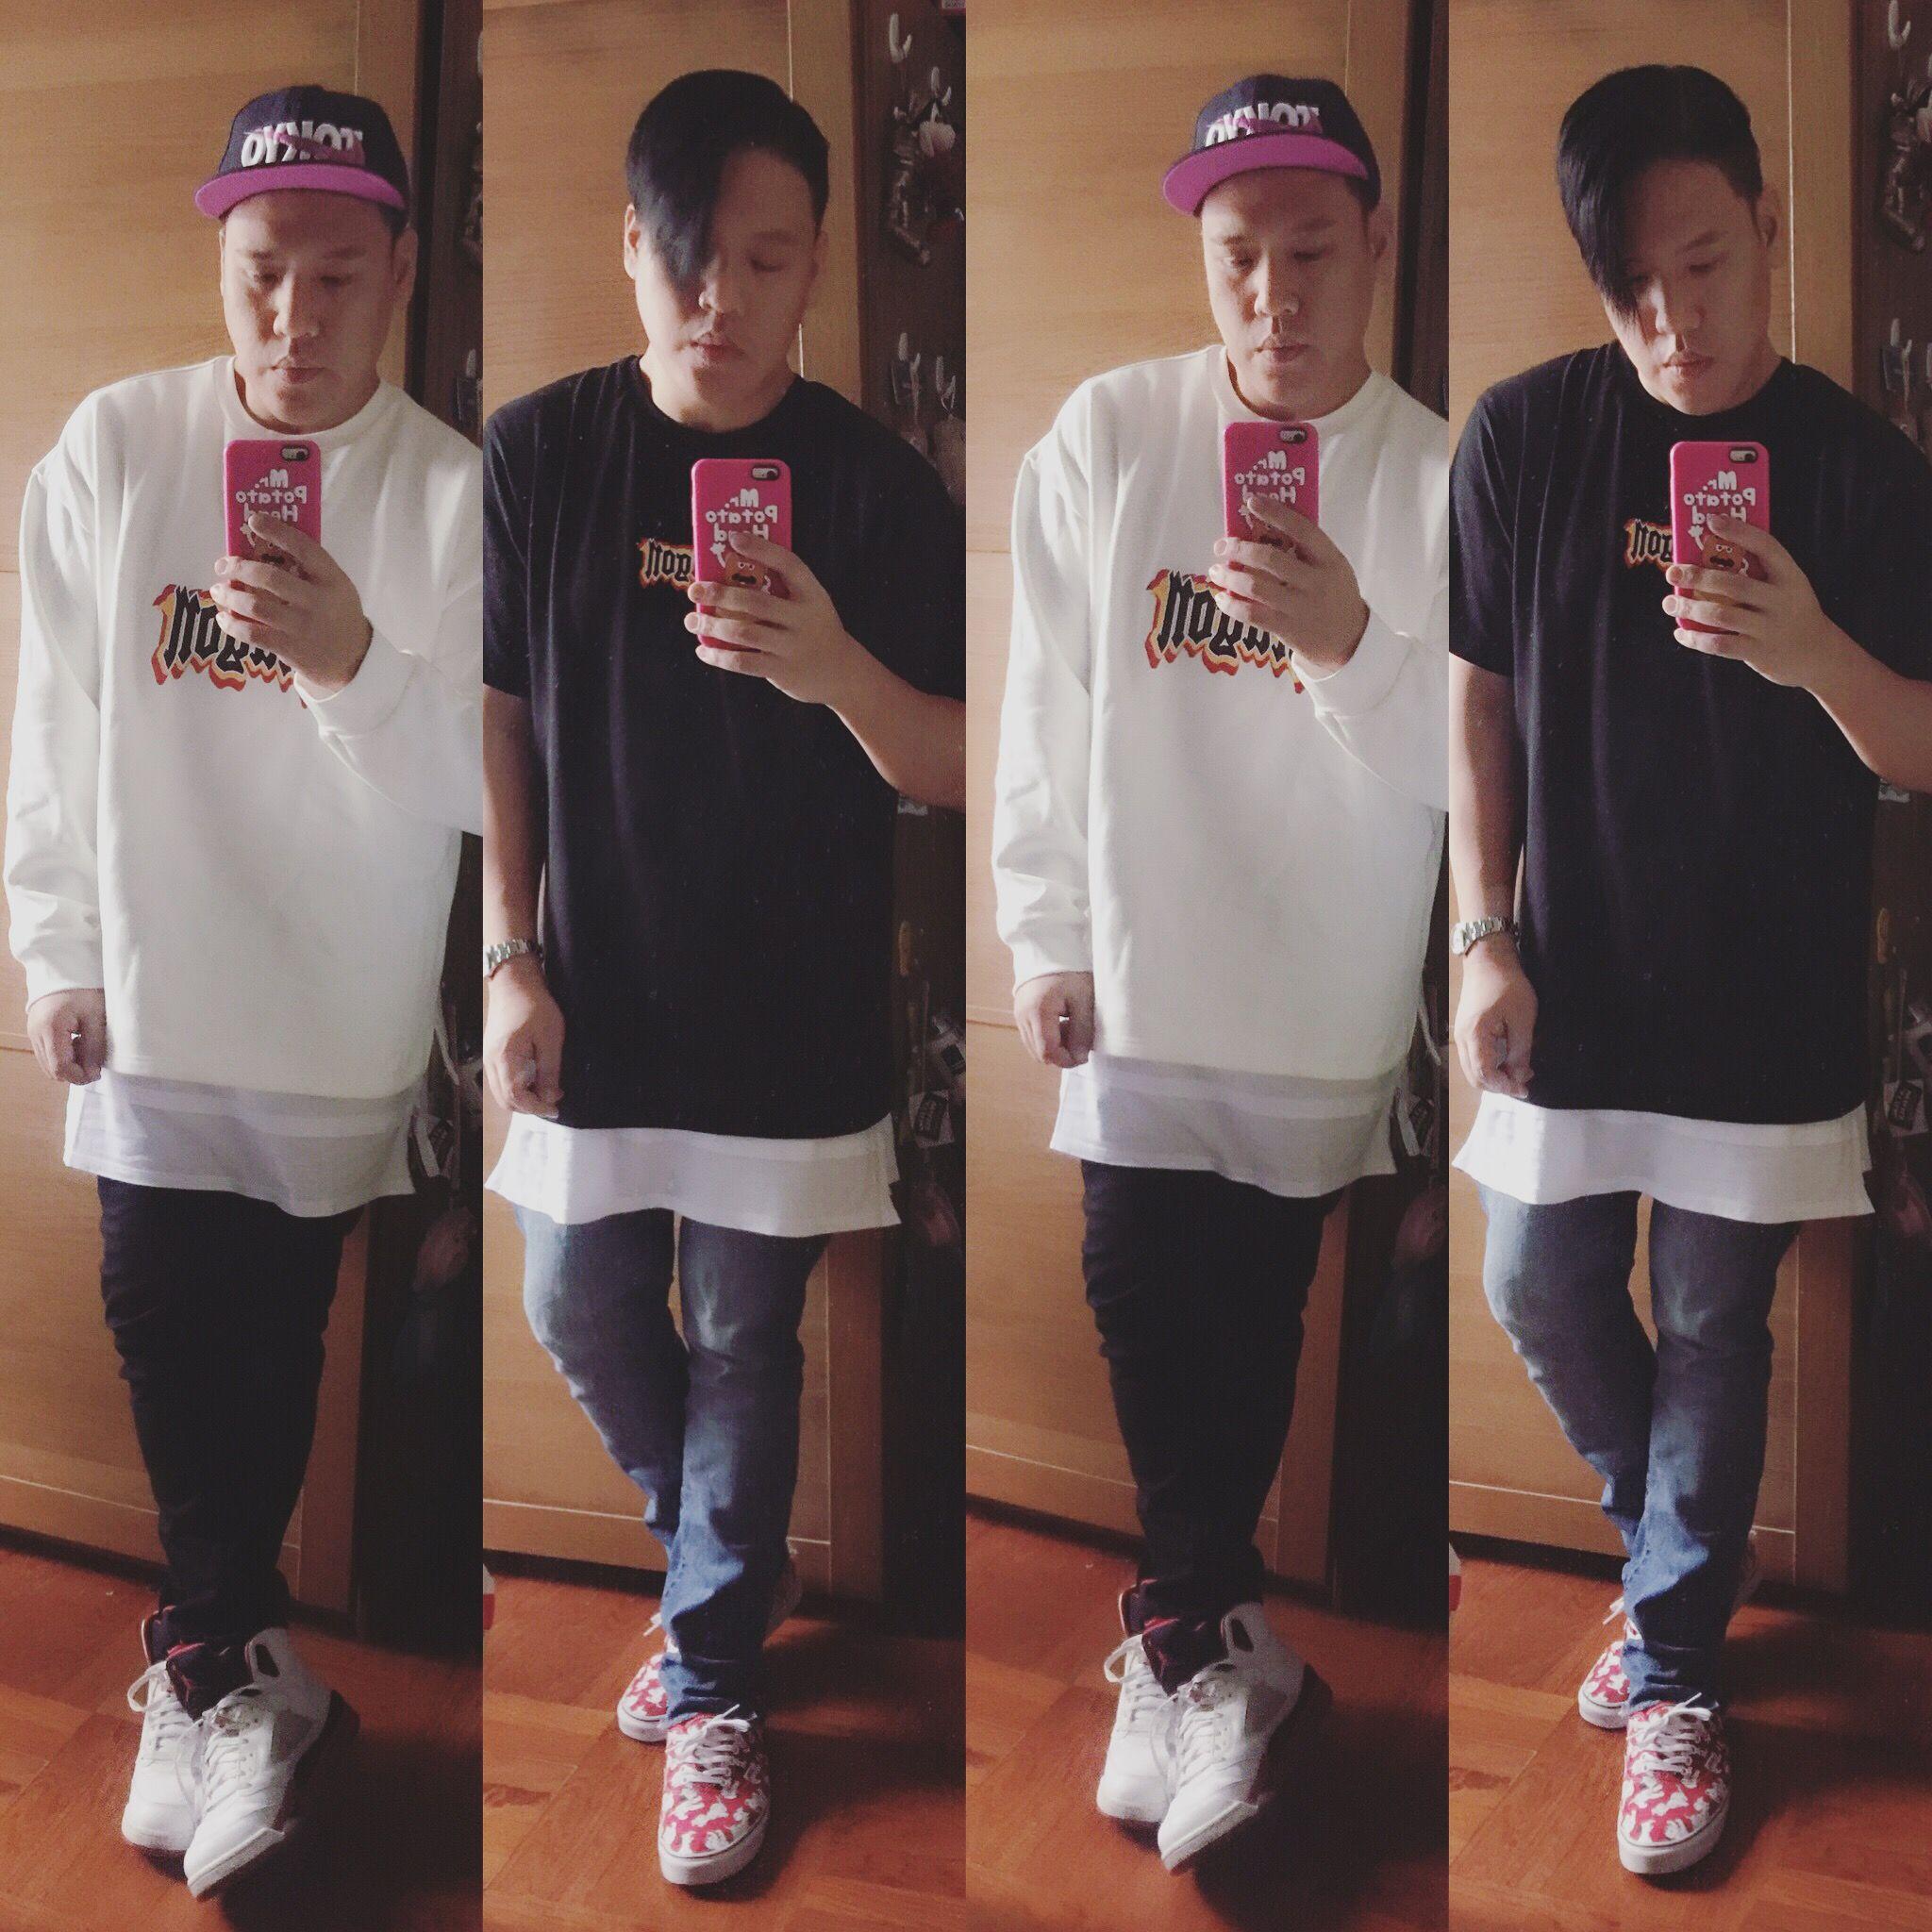 8seconds x GF   #dope #swag #swagger  #edimundsonootd #menswears #mensweardaily #mensfashion #mensfashionblogger #mensfashionguide #mensfashionposts #streetfashion #streetfashionstyle  #ootd #lookoftheday #stylemen #instafashion #instastyle #sneakers